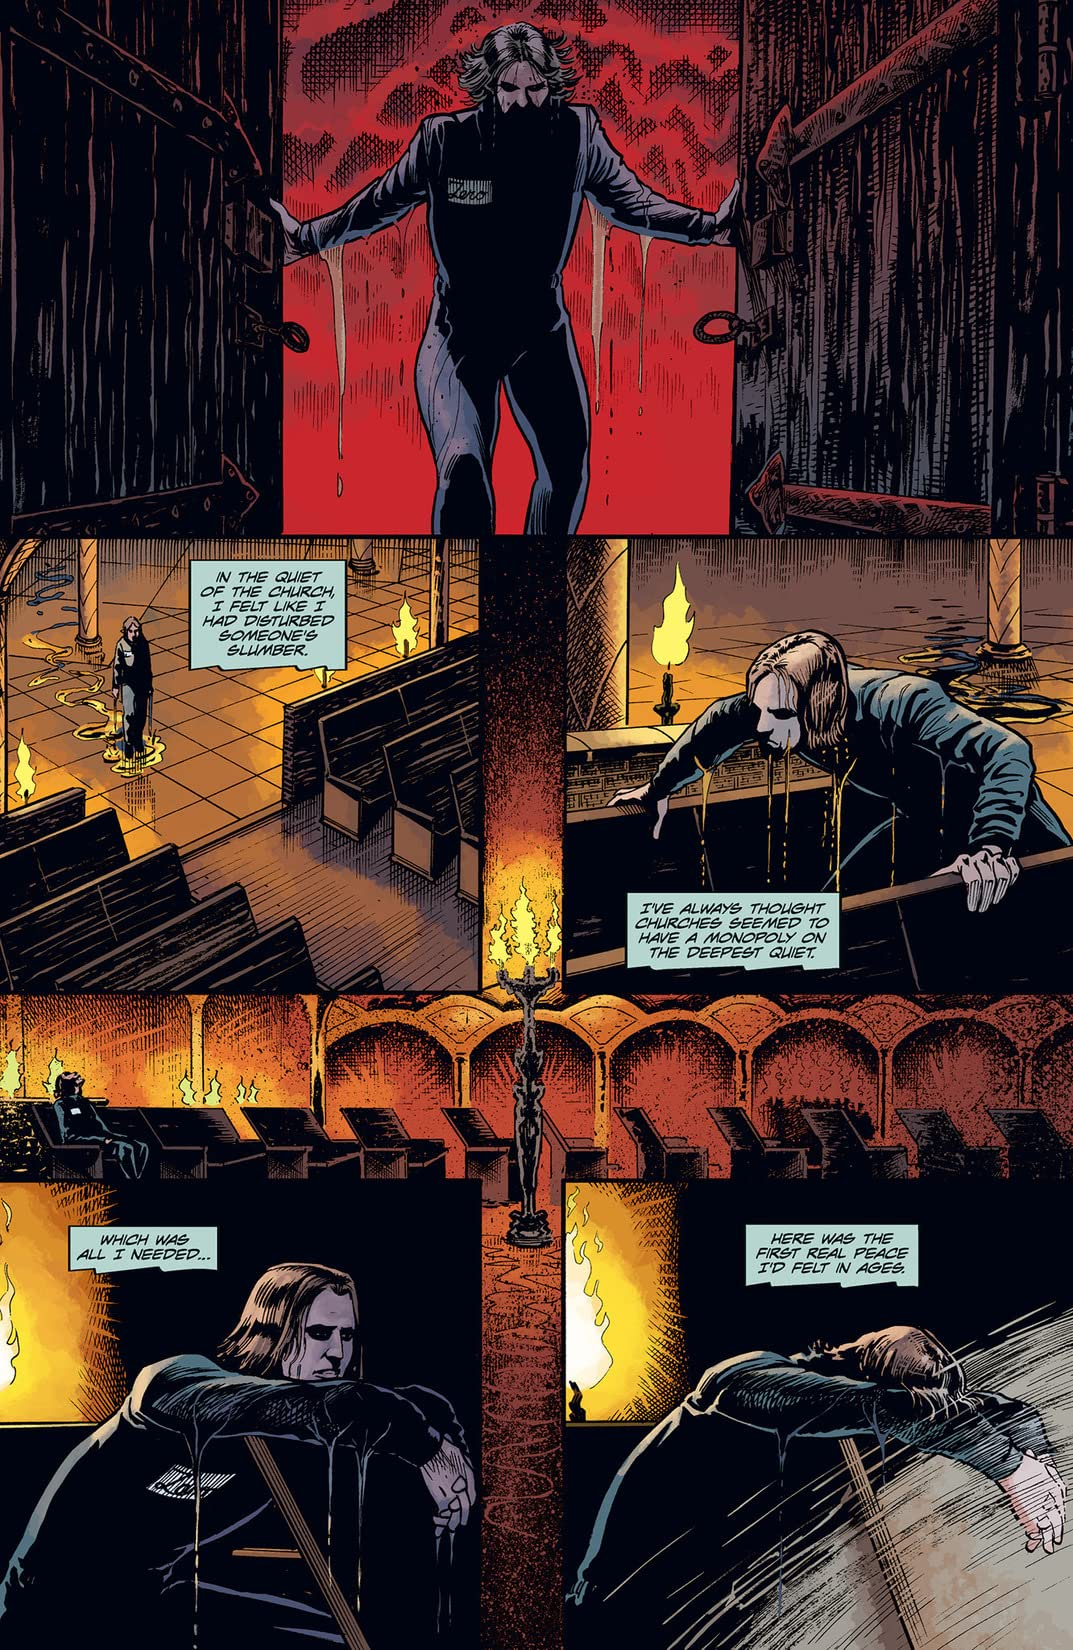 House of Gold & Bones #4